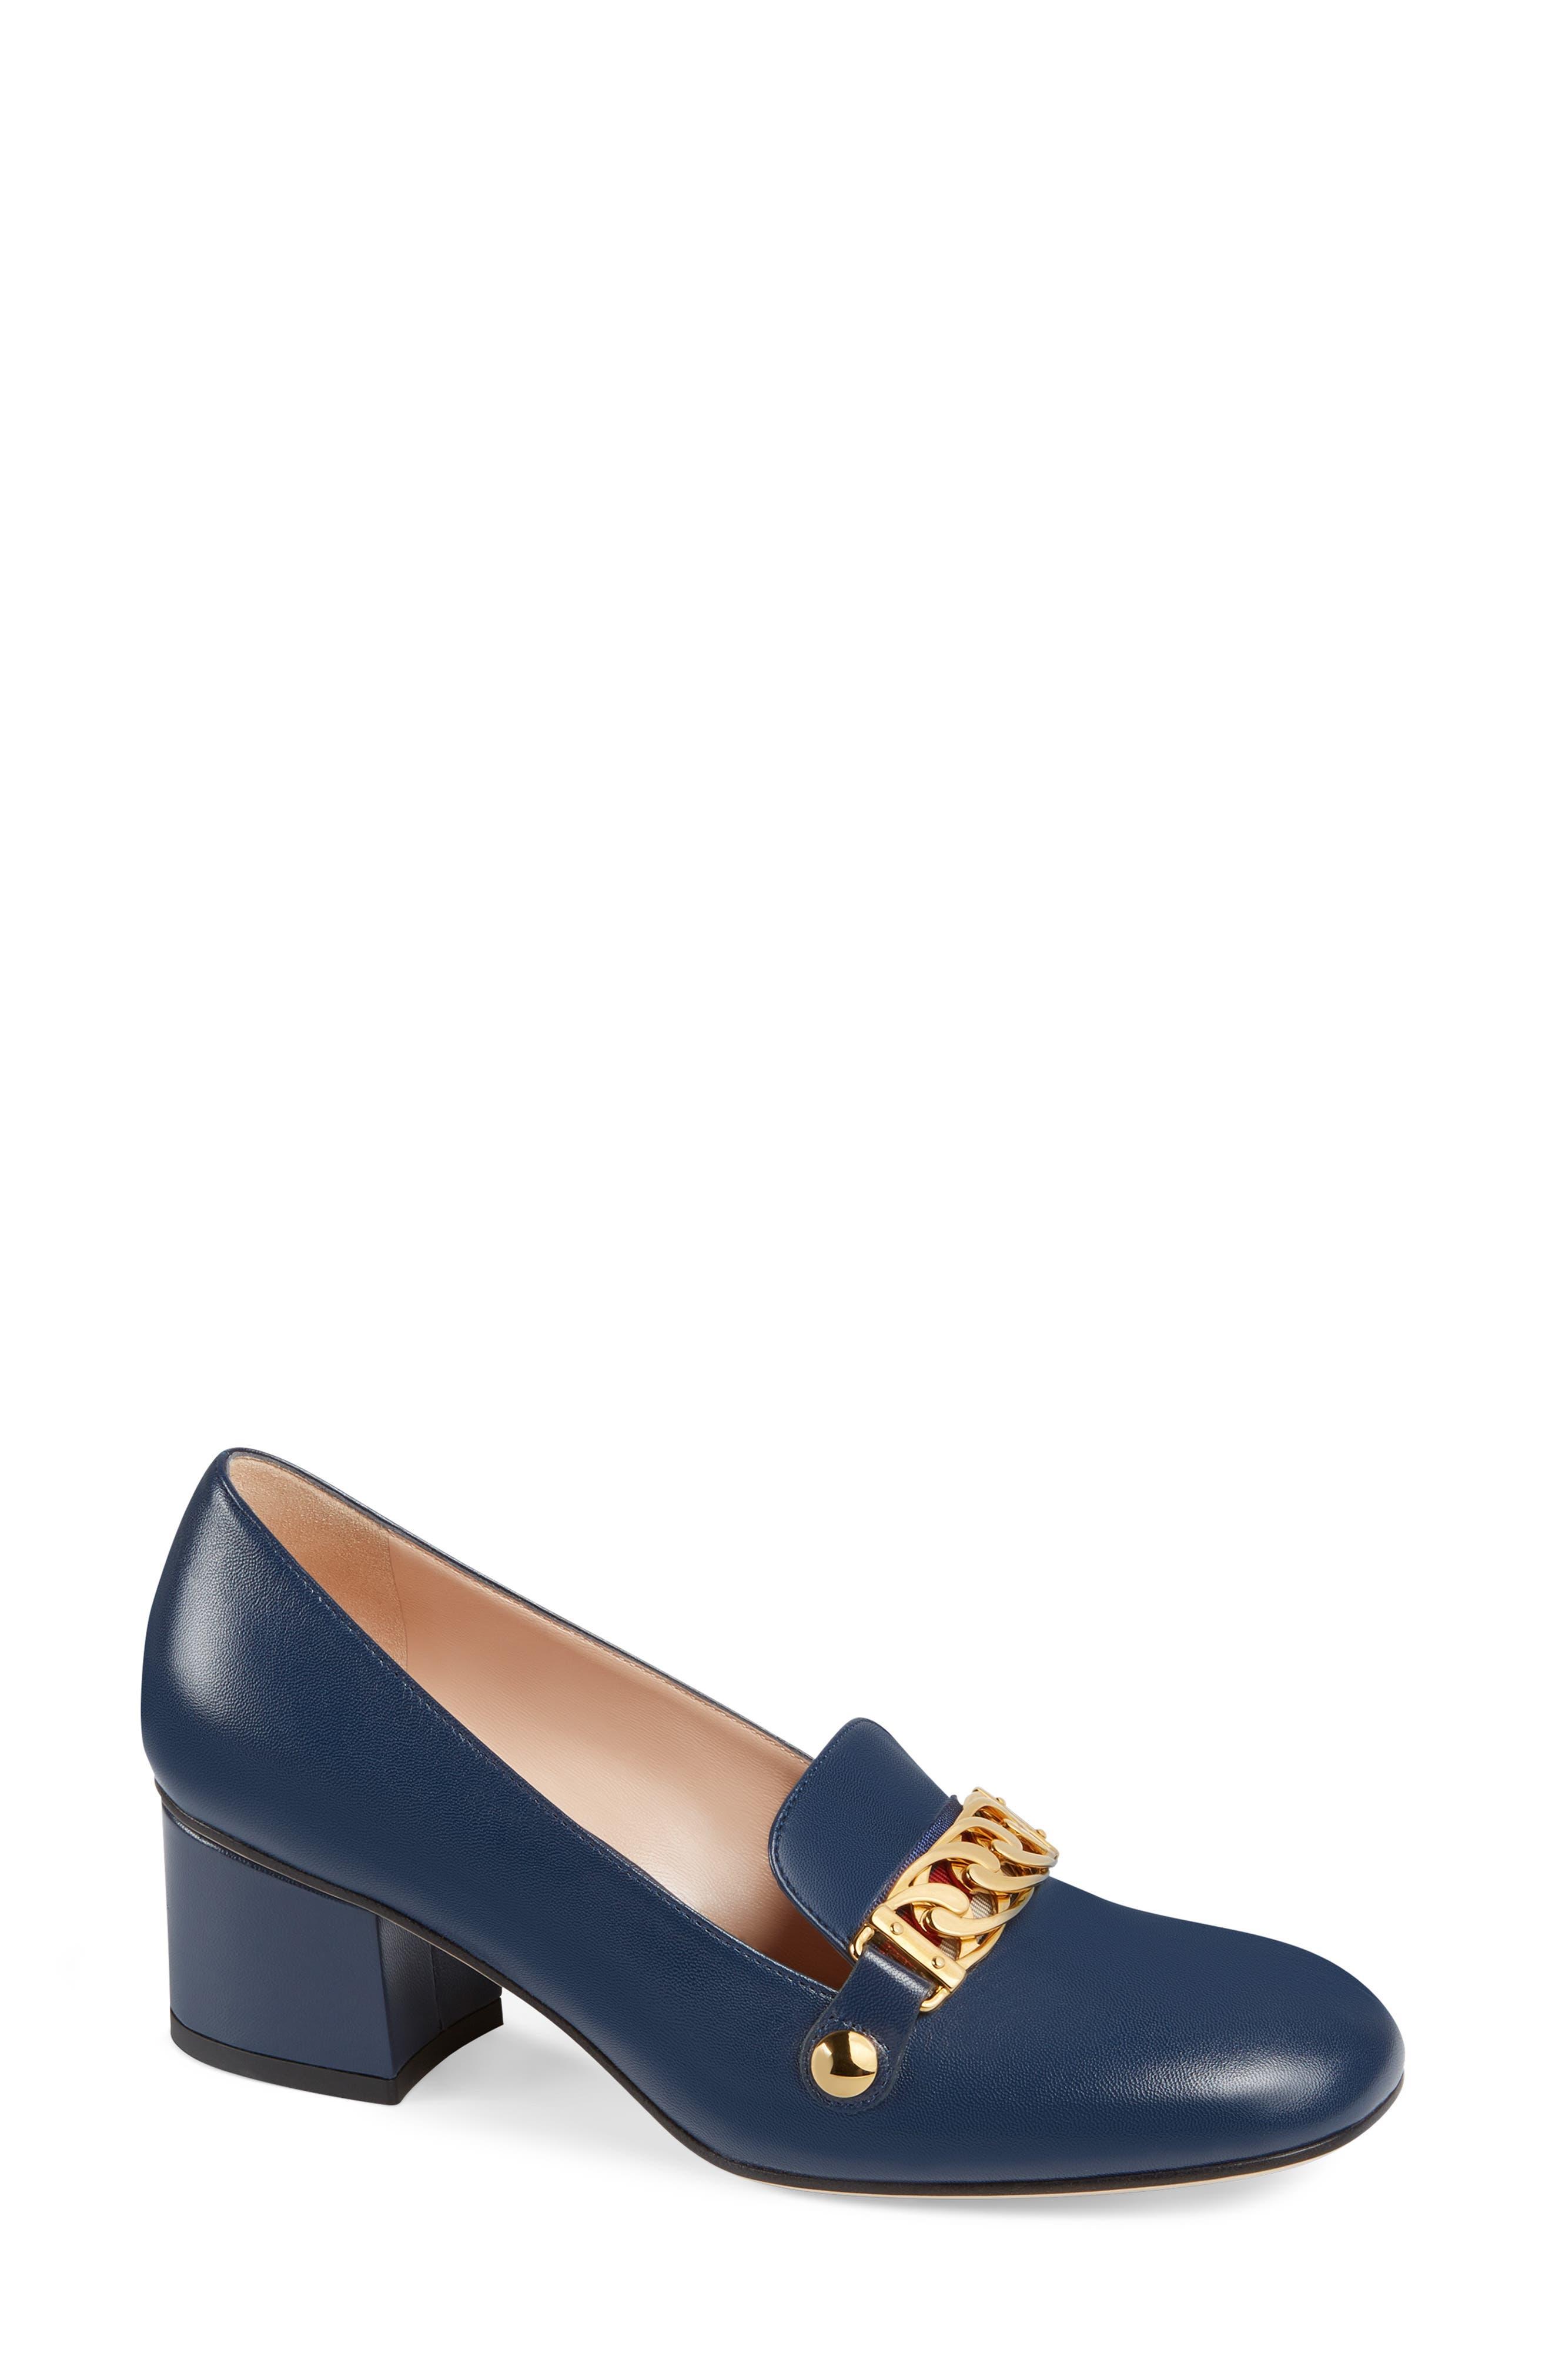 Gucci Sylvie Loafer Pump - Blue